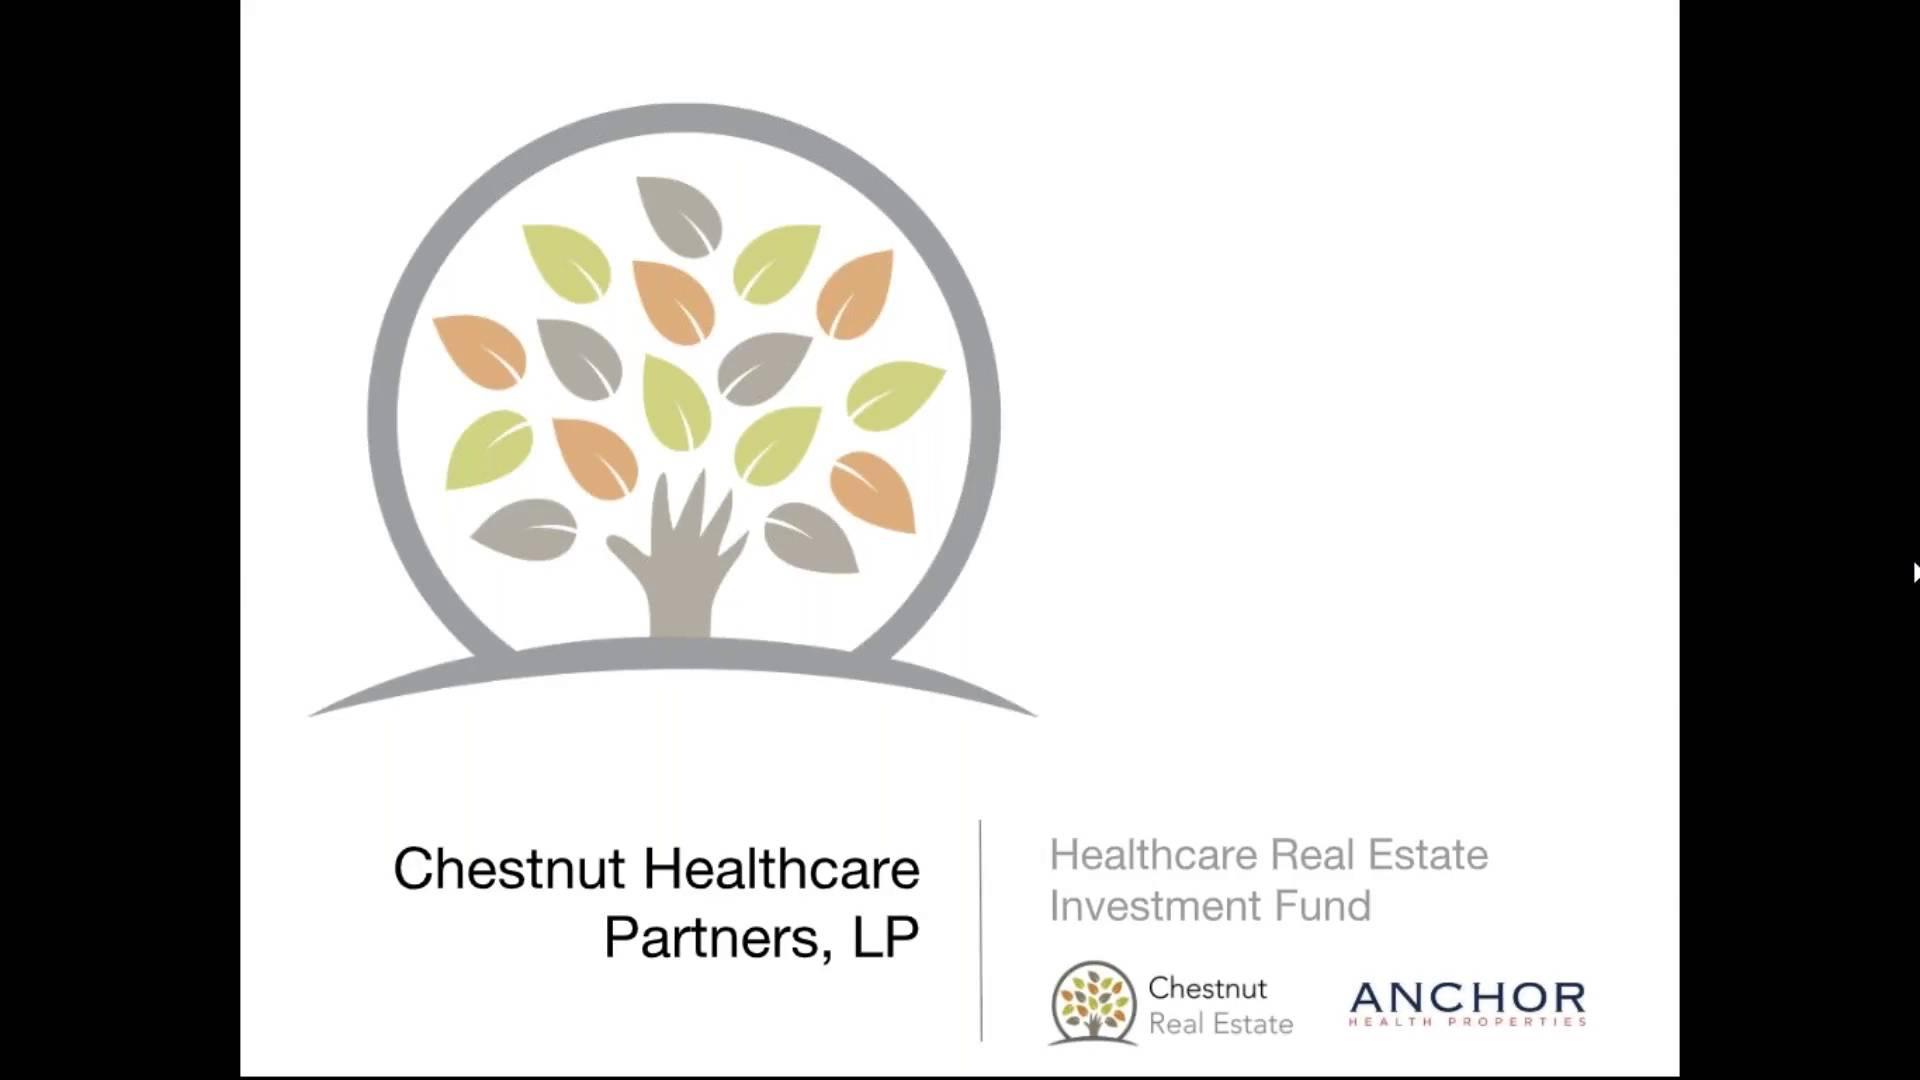 Investment Video - Chestnut Healthcare Partners, LP